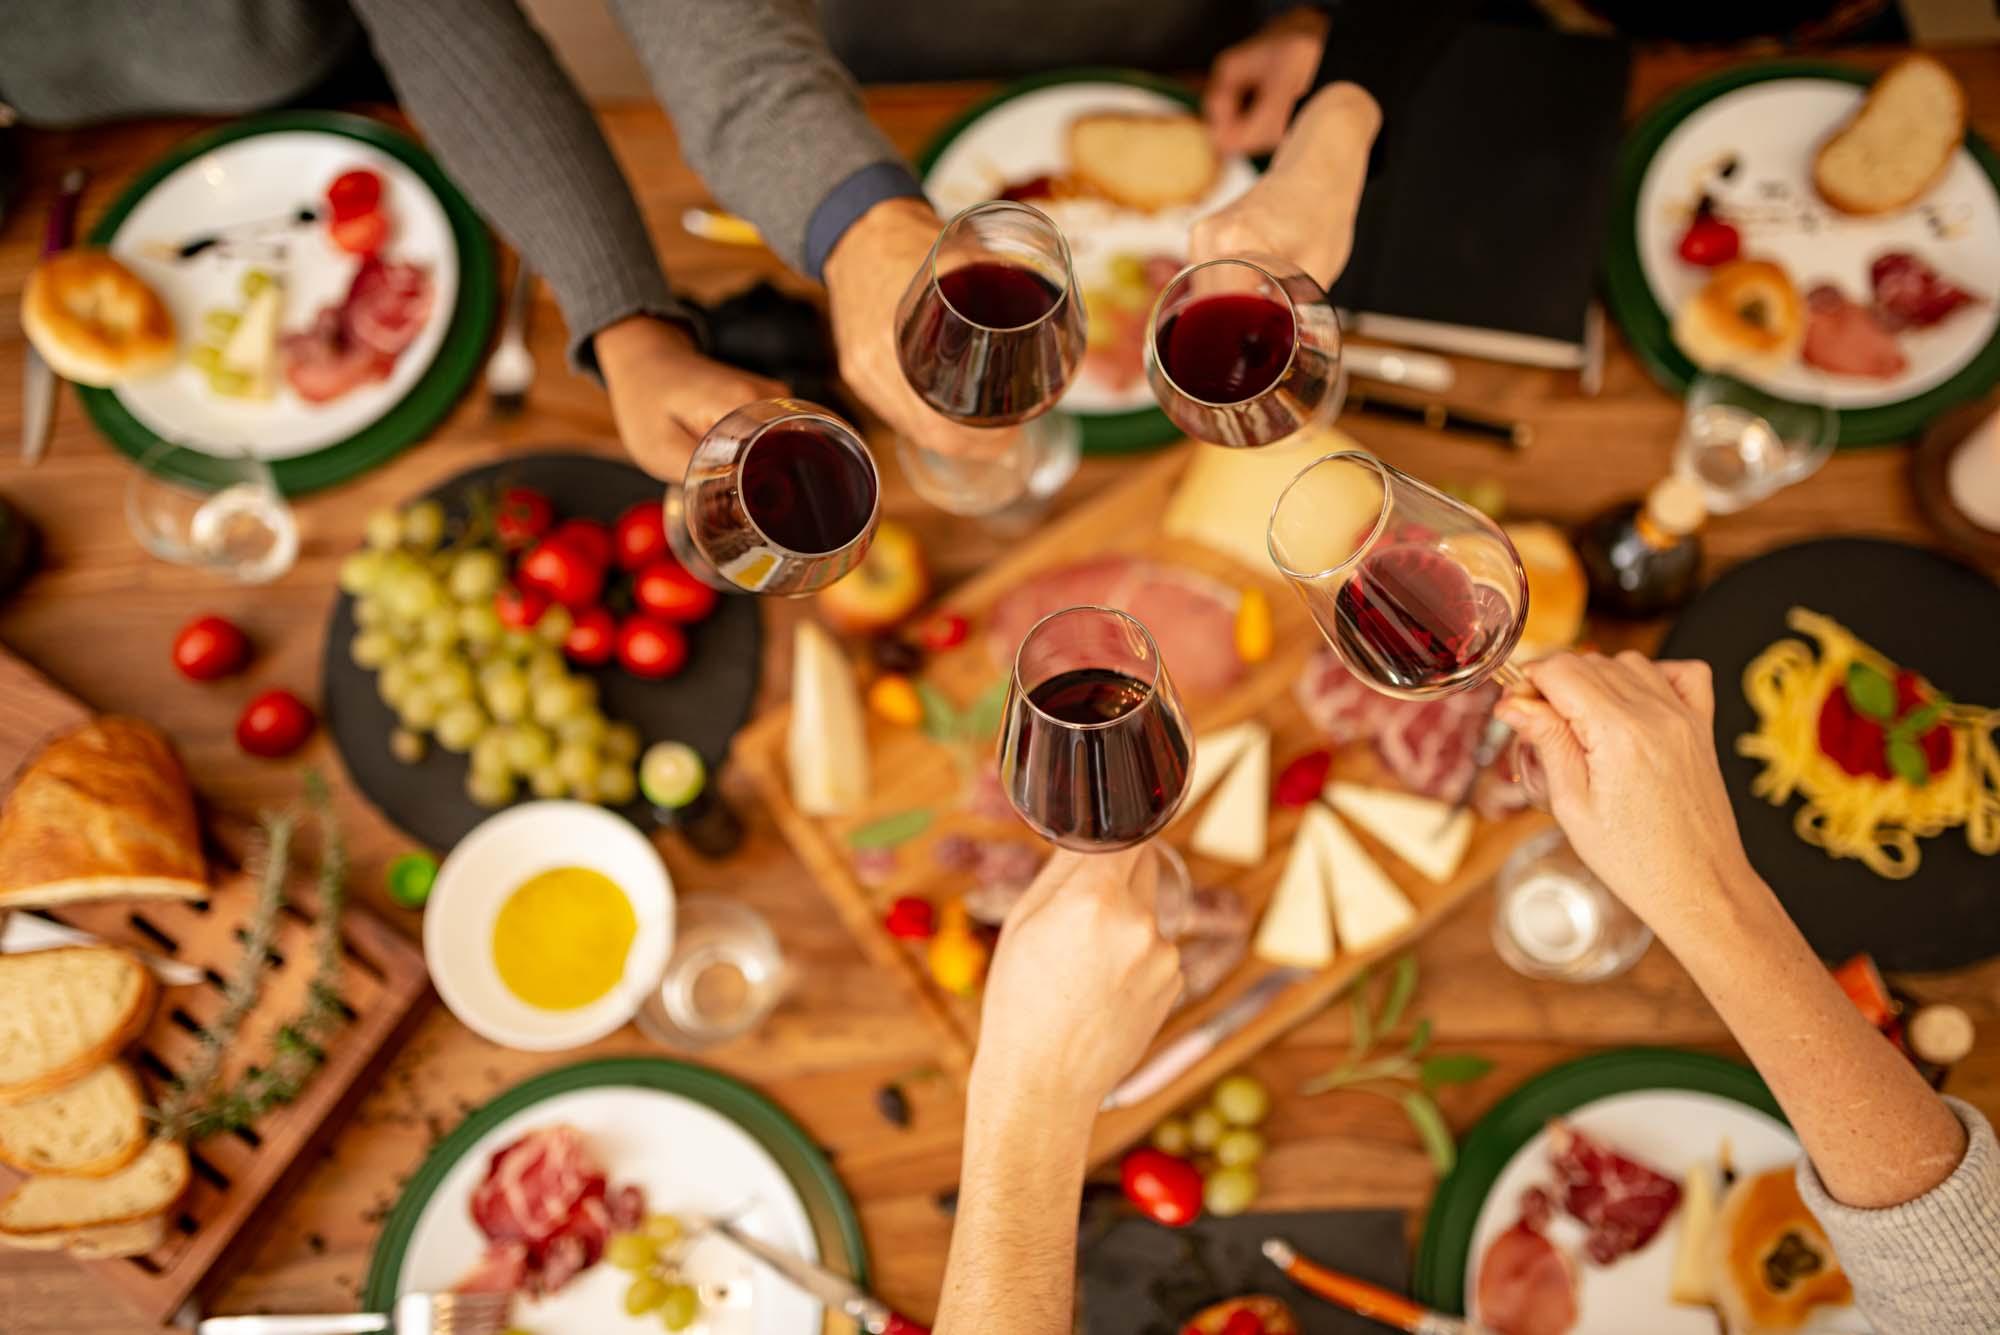 Corsi Di Cucina Eventi Aziendali a Catania